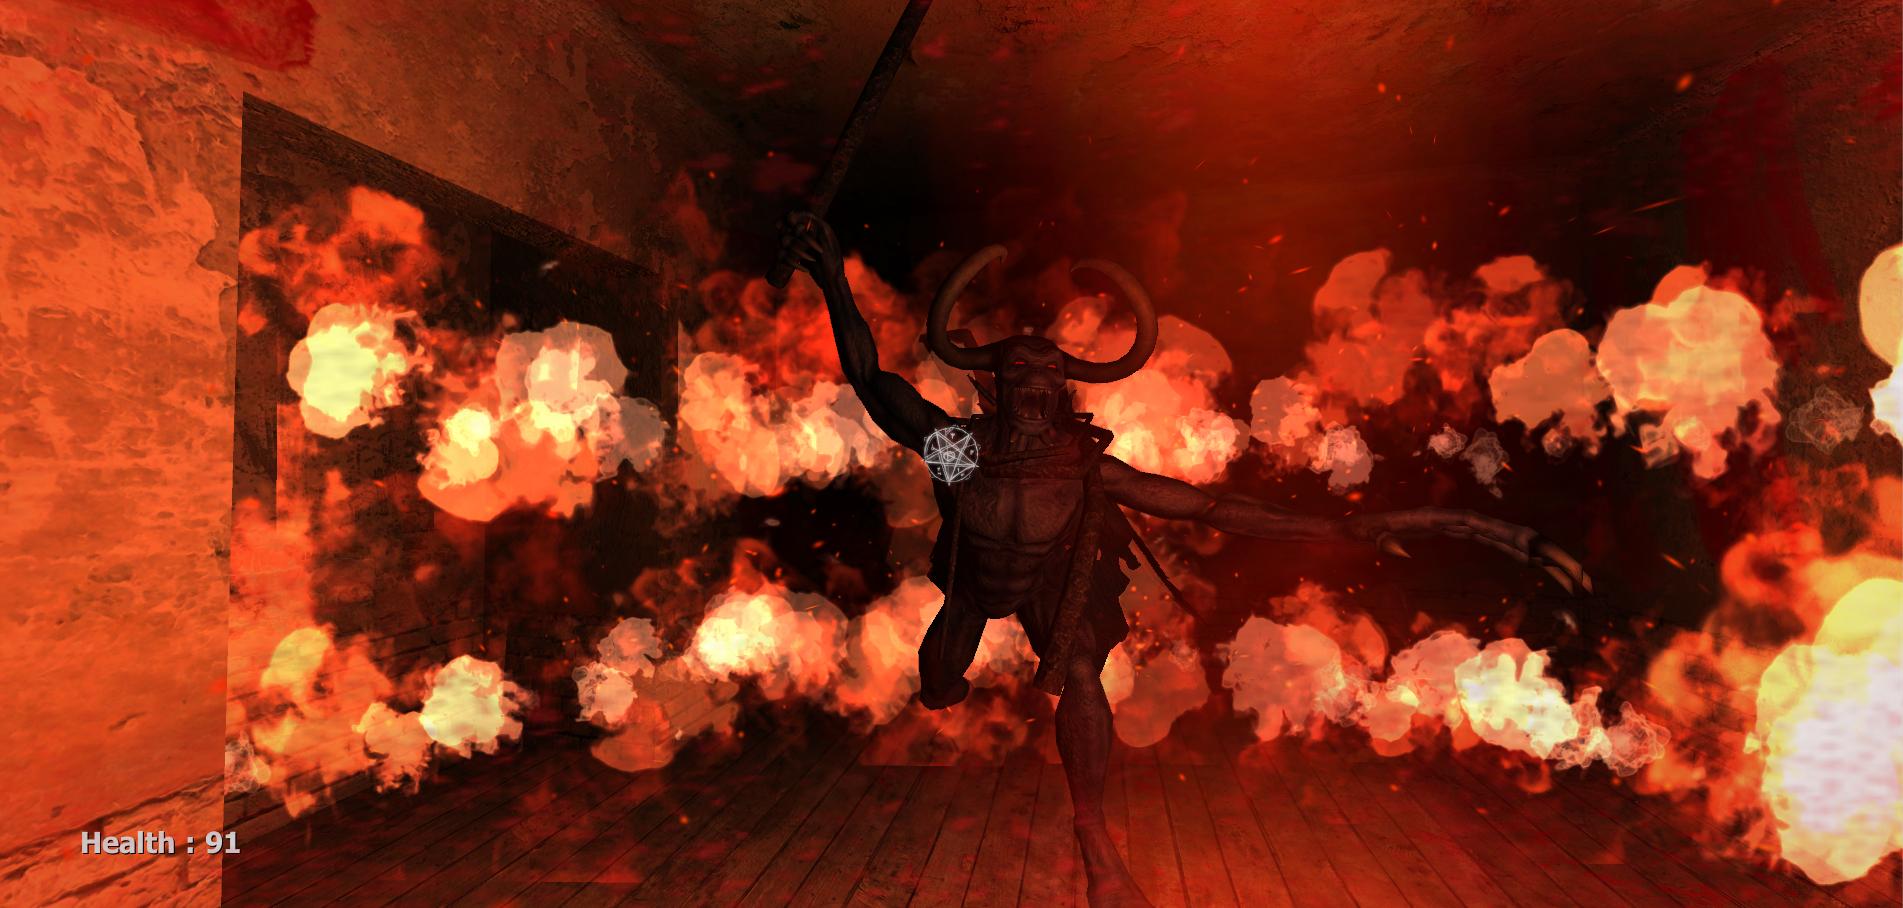 Screenshots image - Zozo  The Ouija Demon Game - Indie DBZozo Ouija Demon